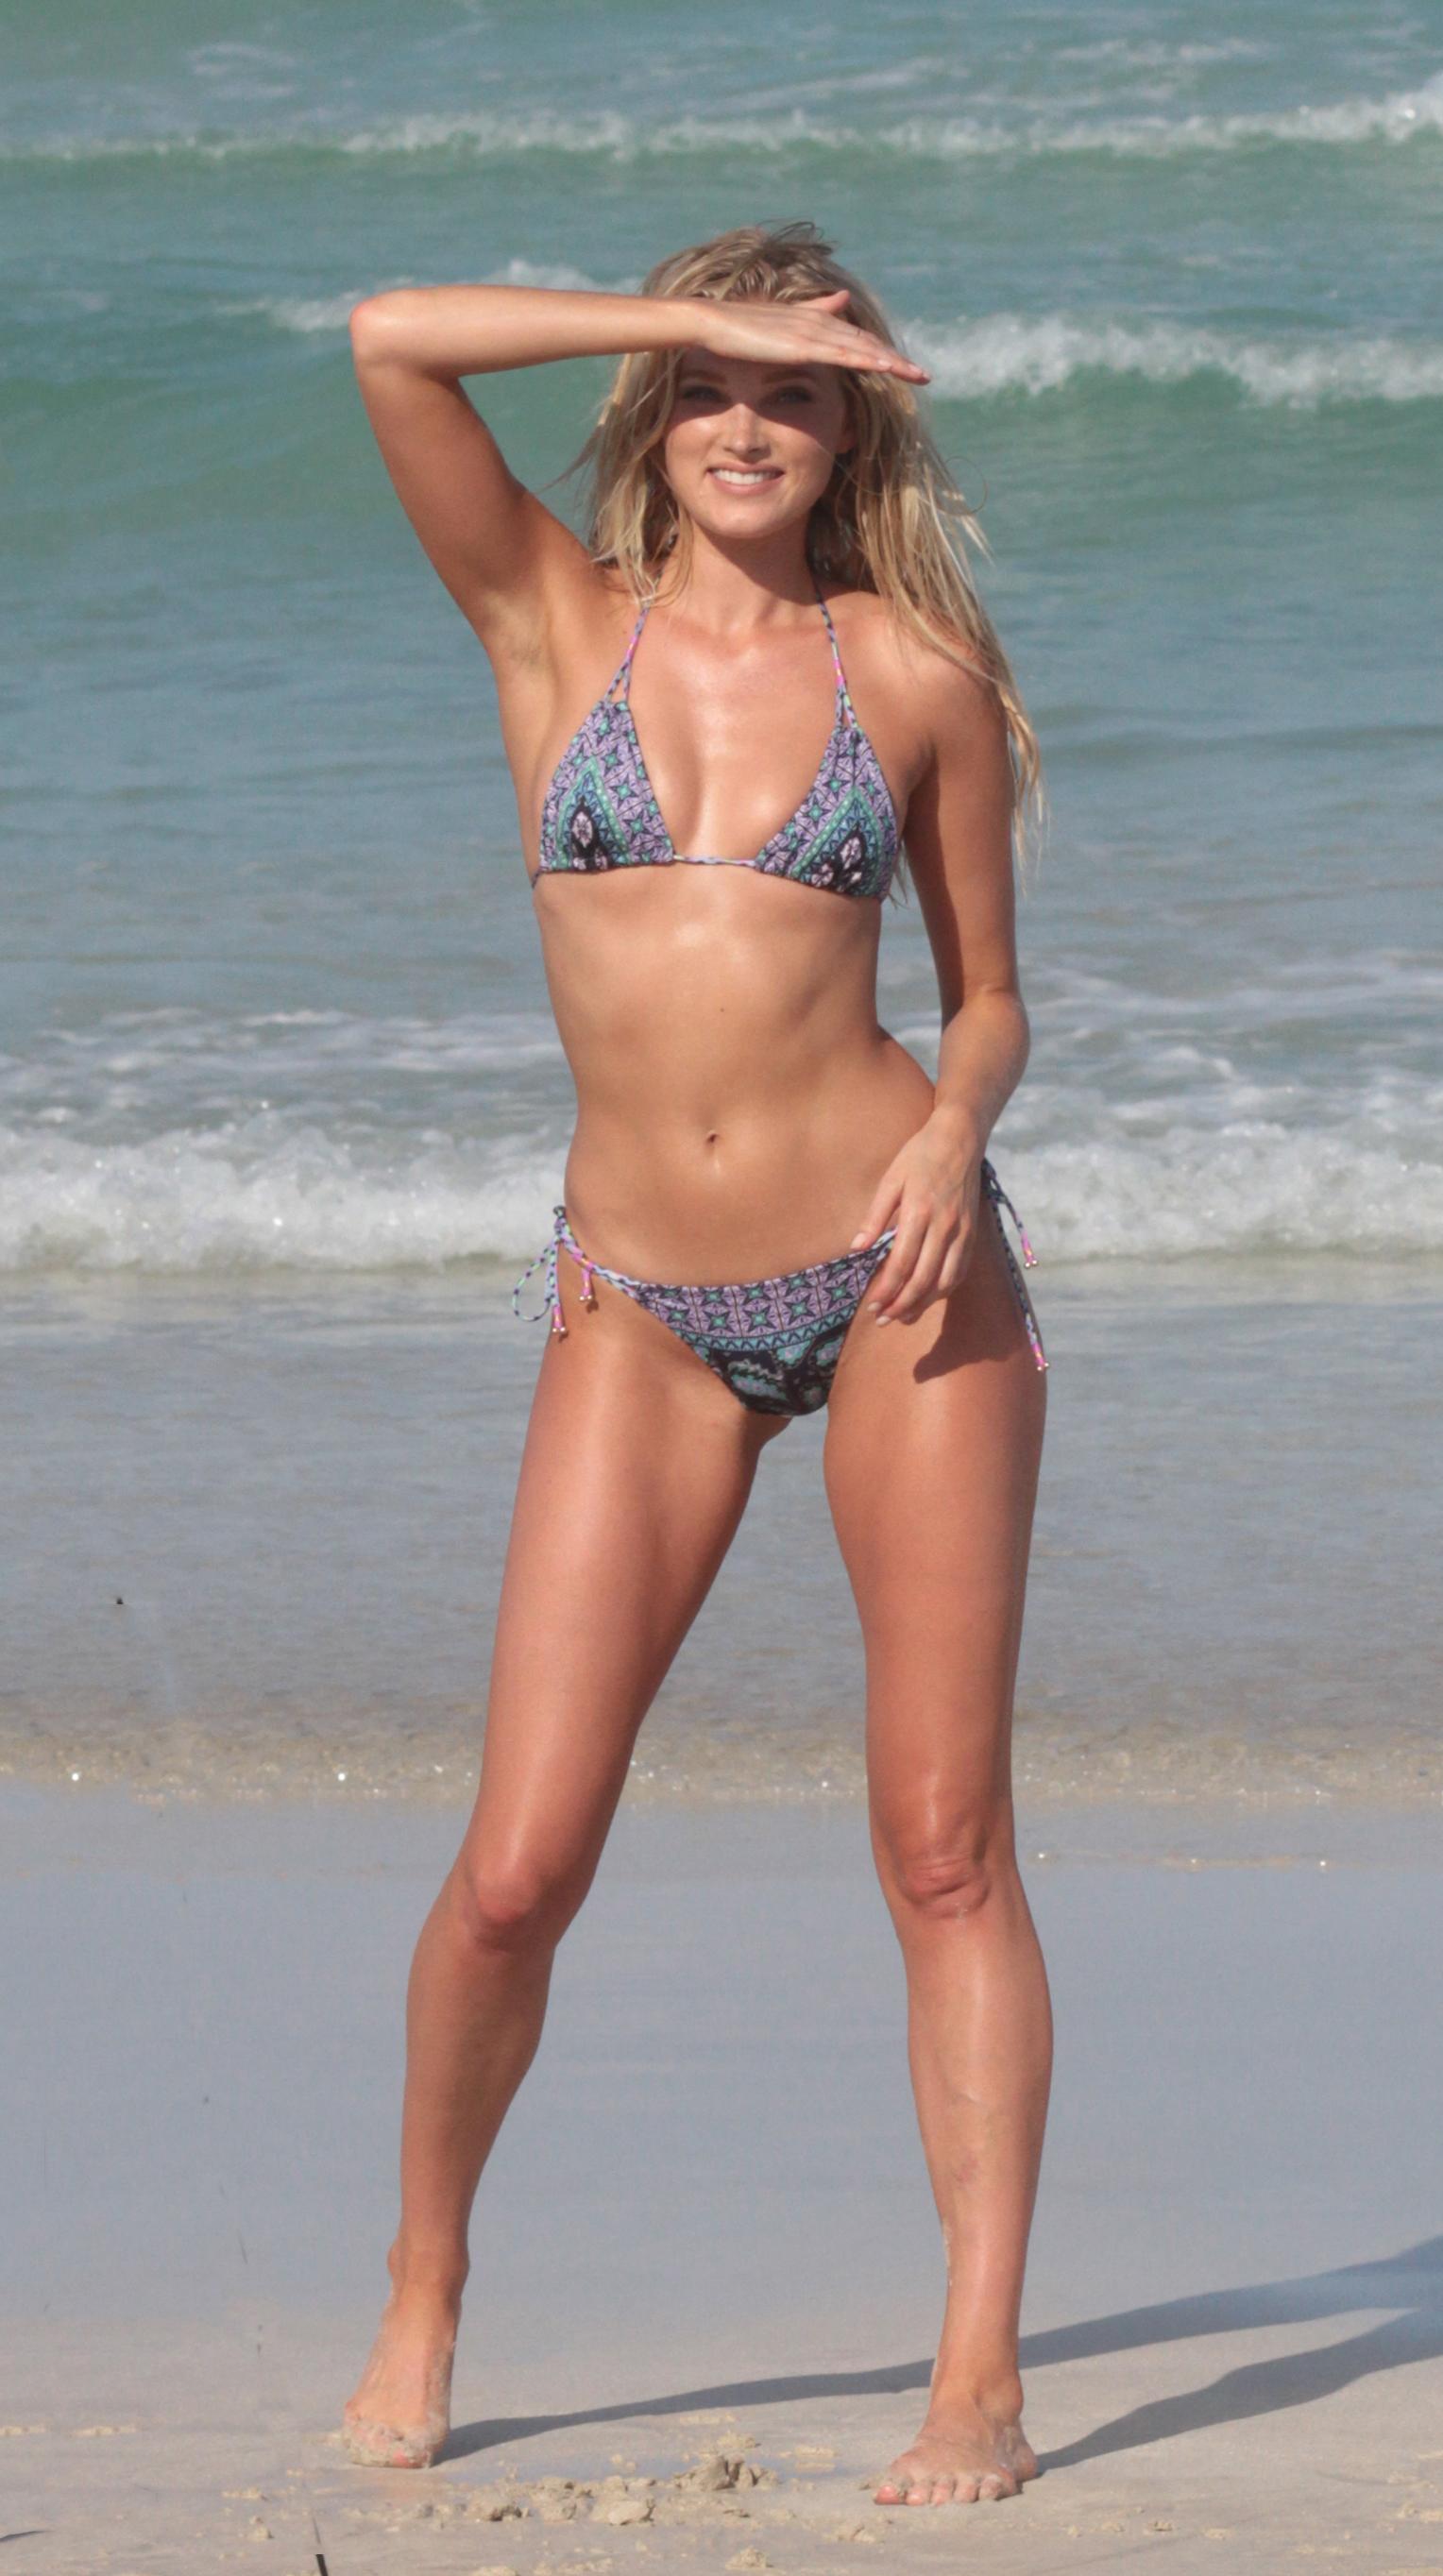 Elsa hosk in bikini new picture